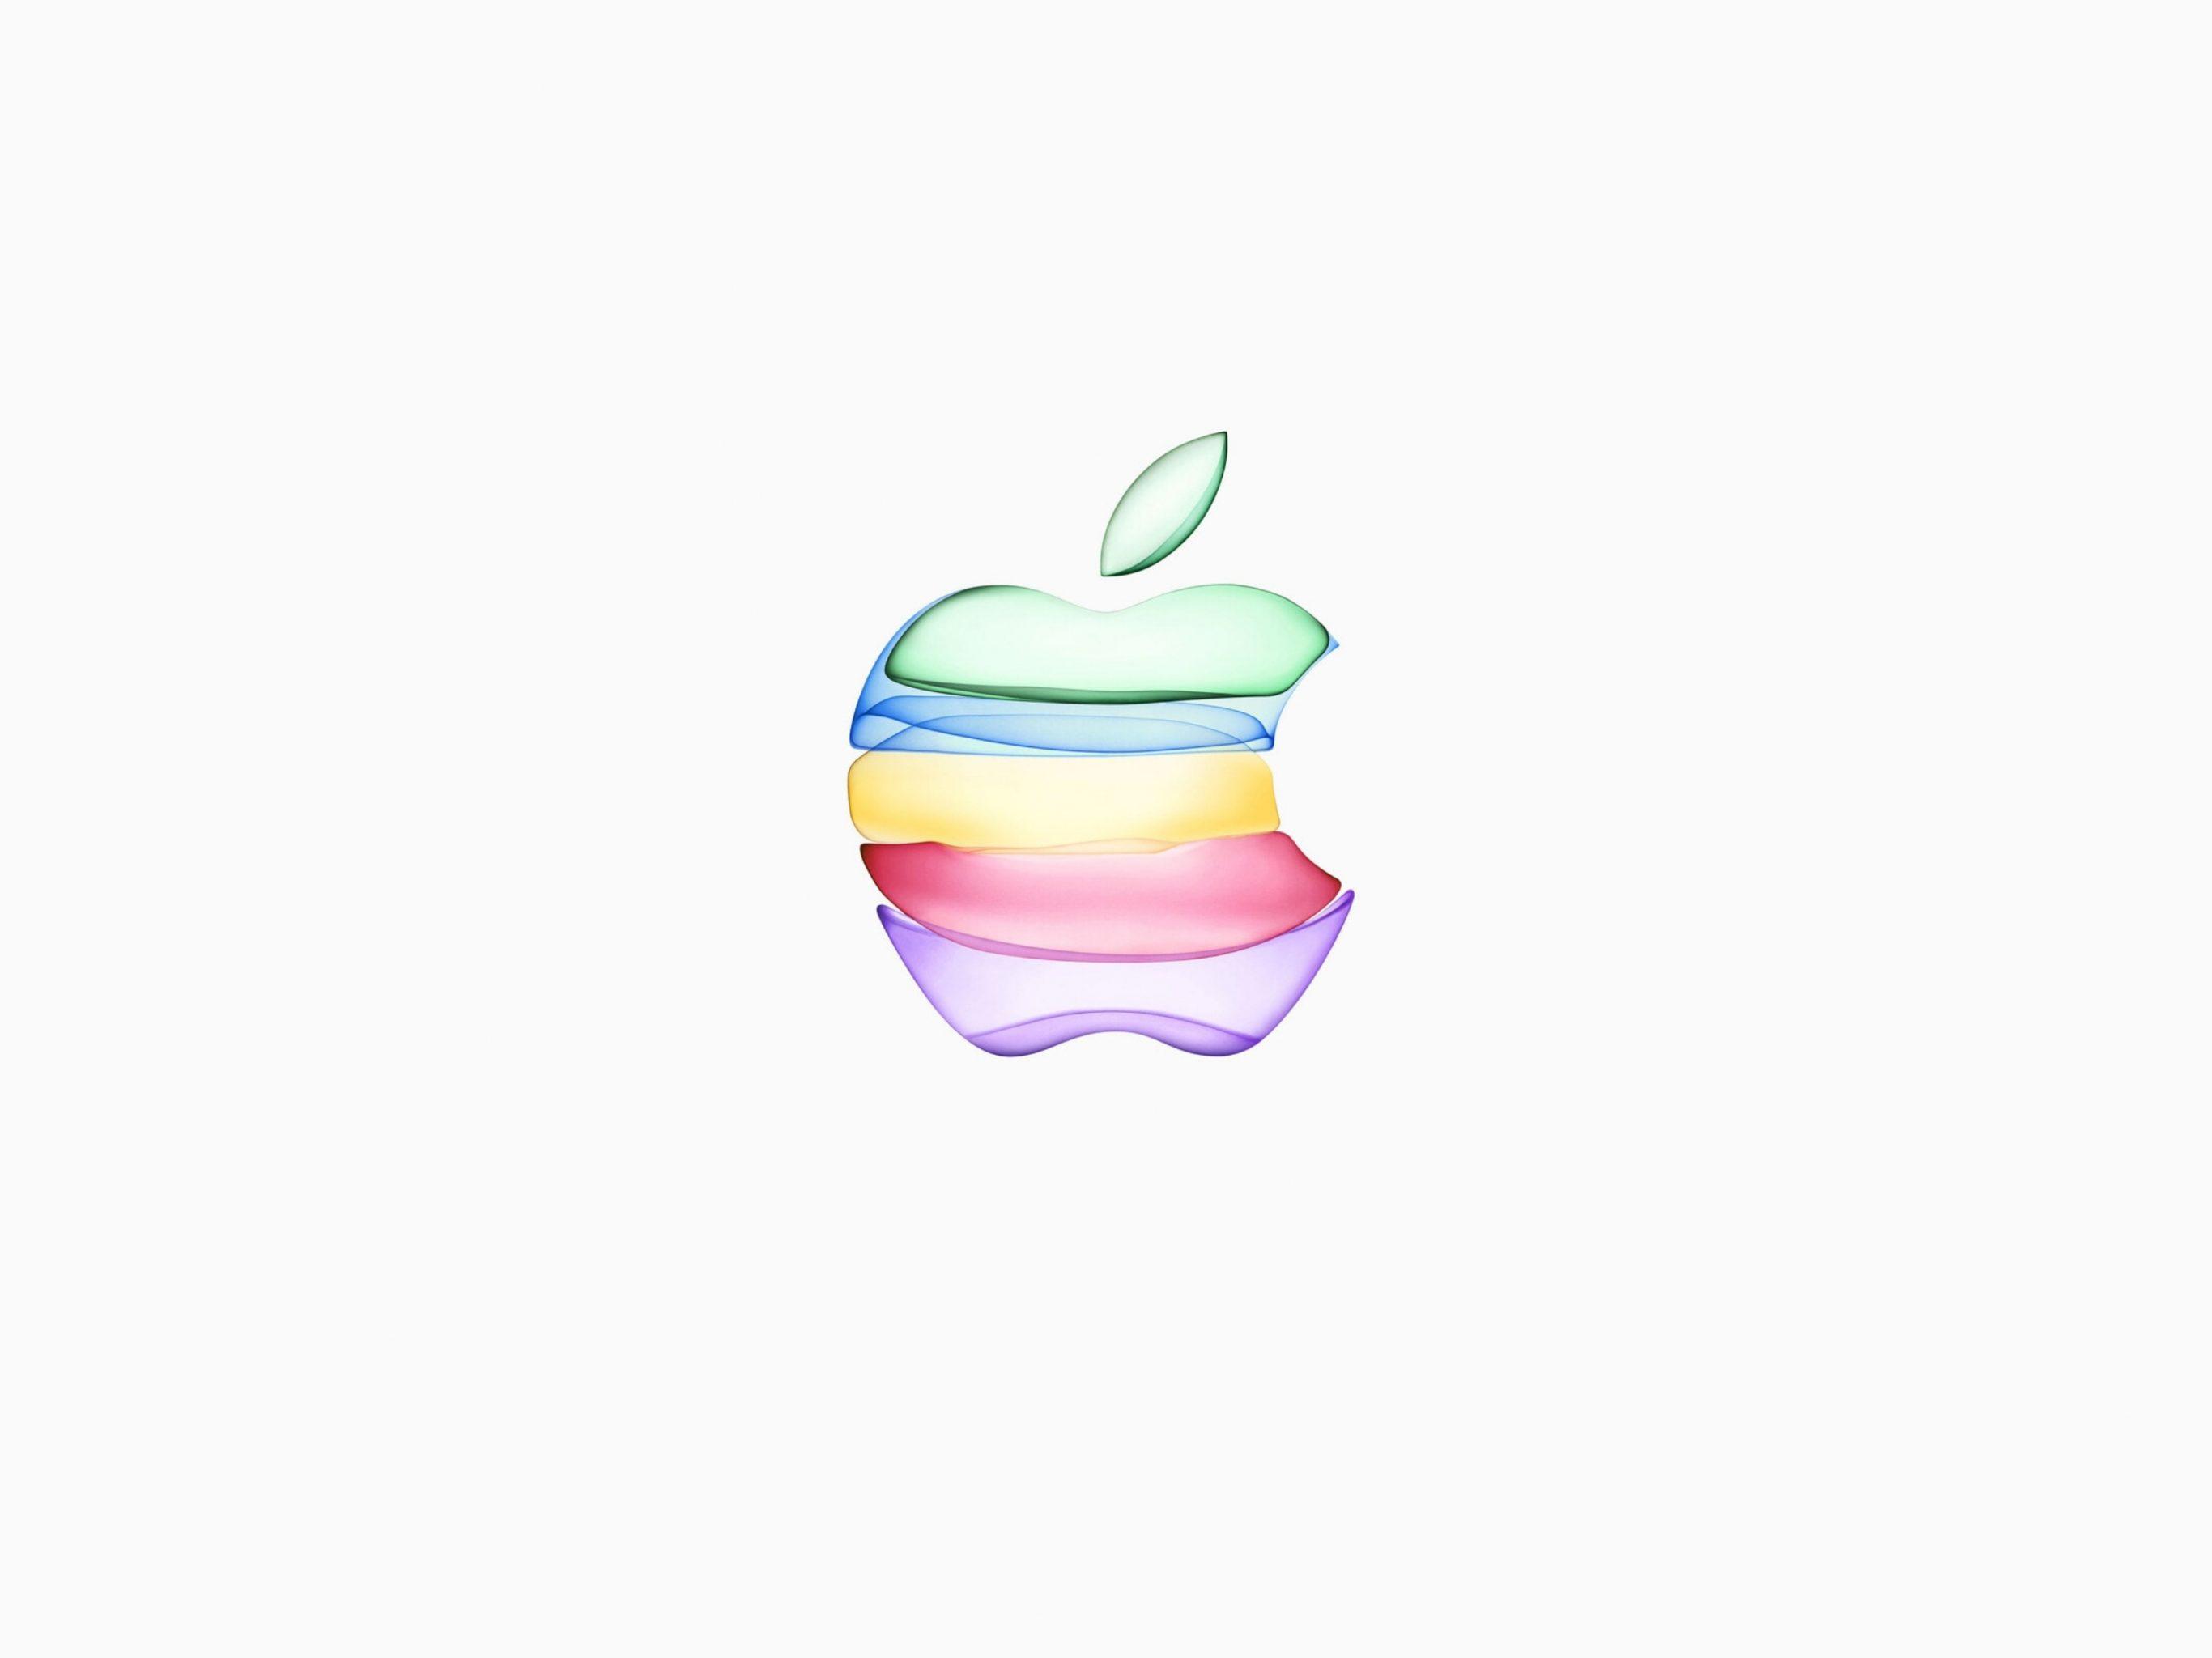 2732x2048 iPad air iPad Pro wallpapers iPhone 11 Apple Logo White Background iPad Wallpaper 2732x2048 pixels resolution